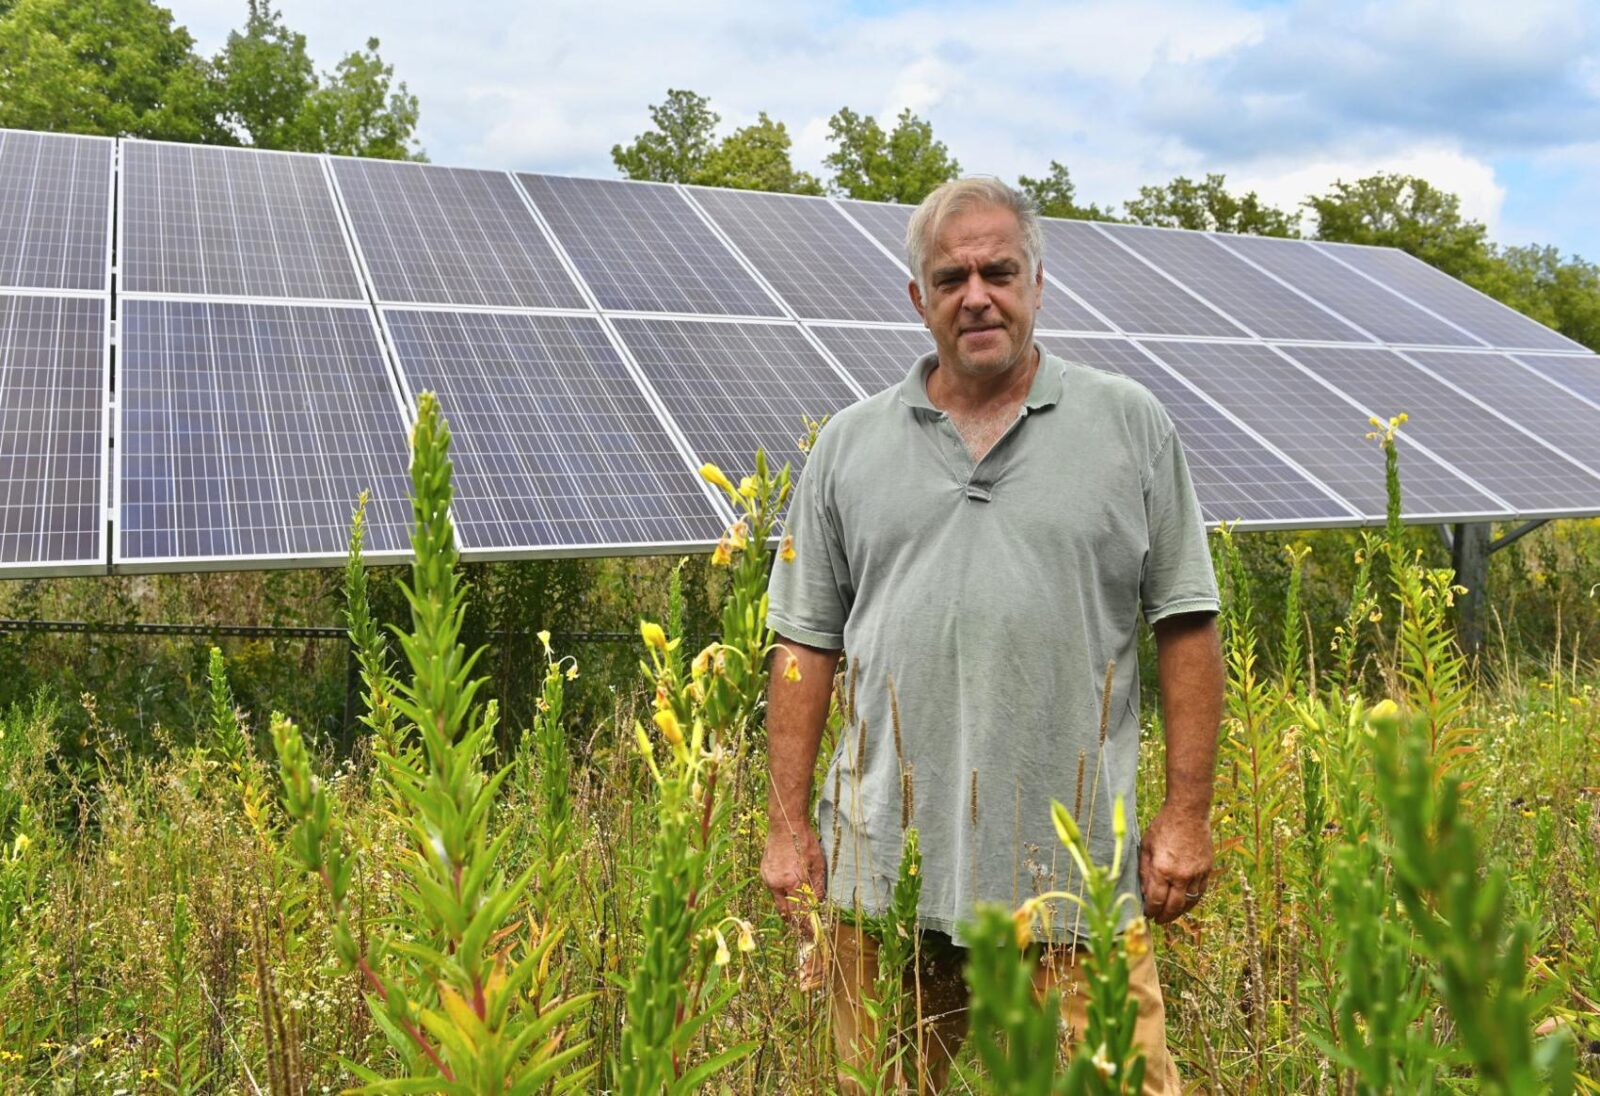 Bee friendly: Solar firms look to help pollinators